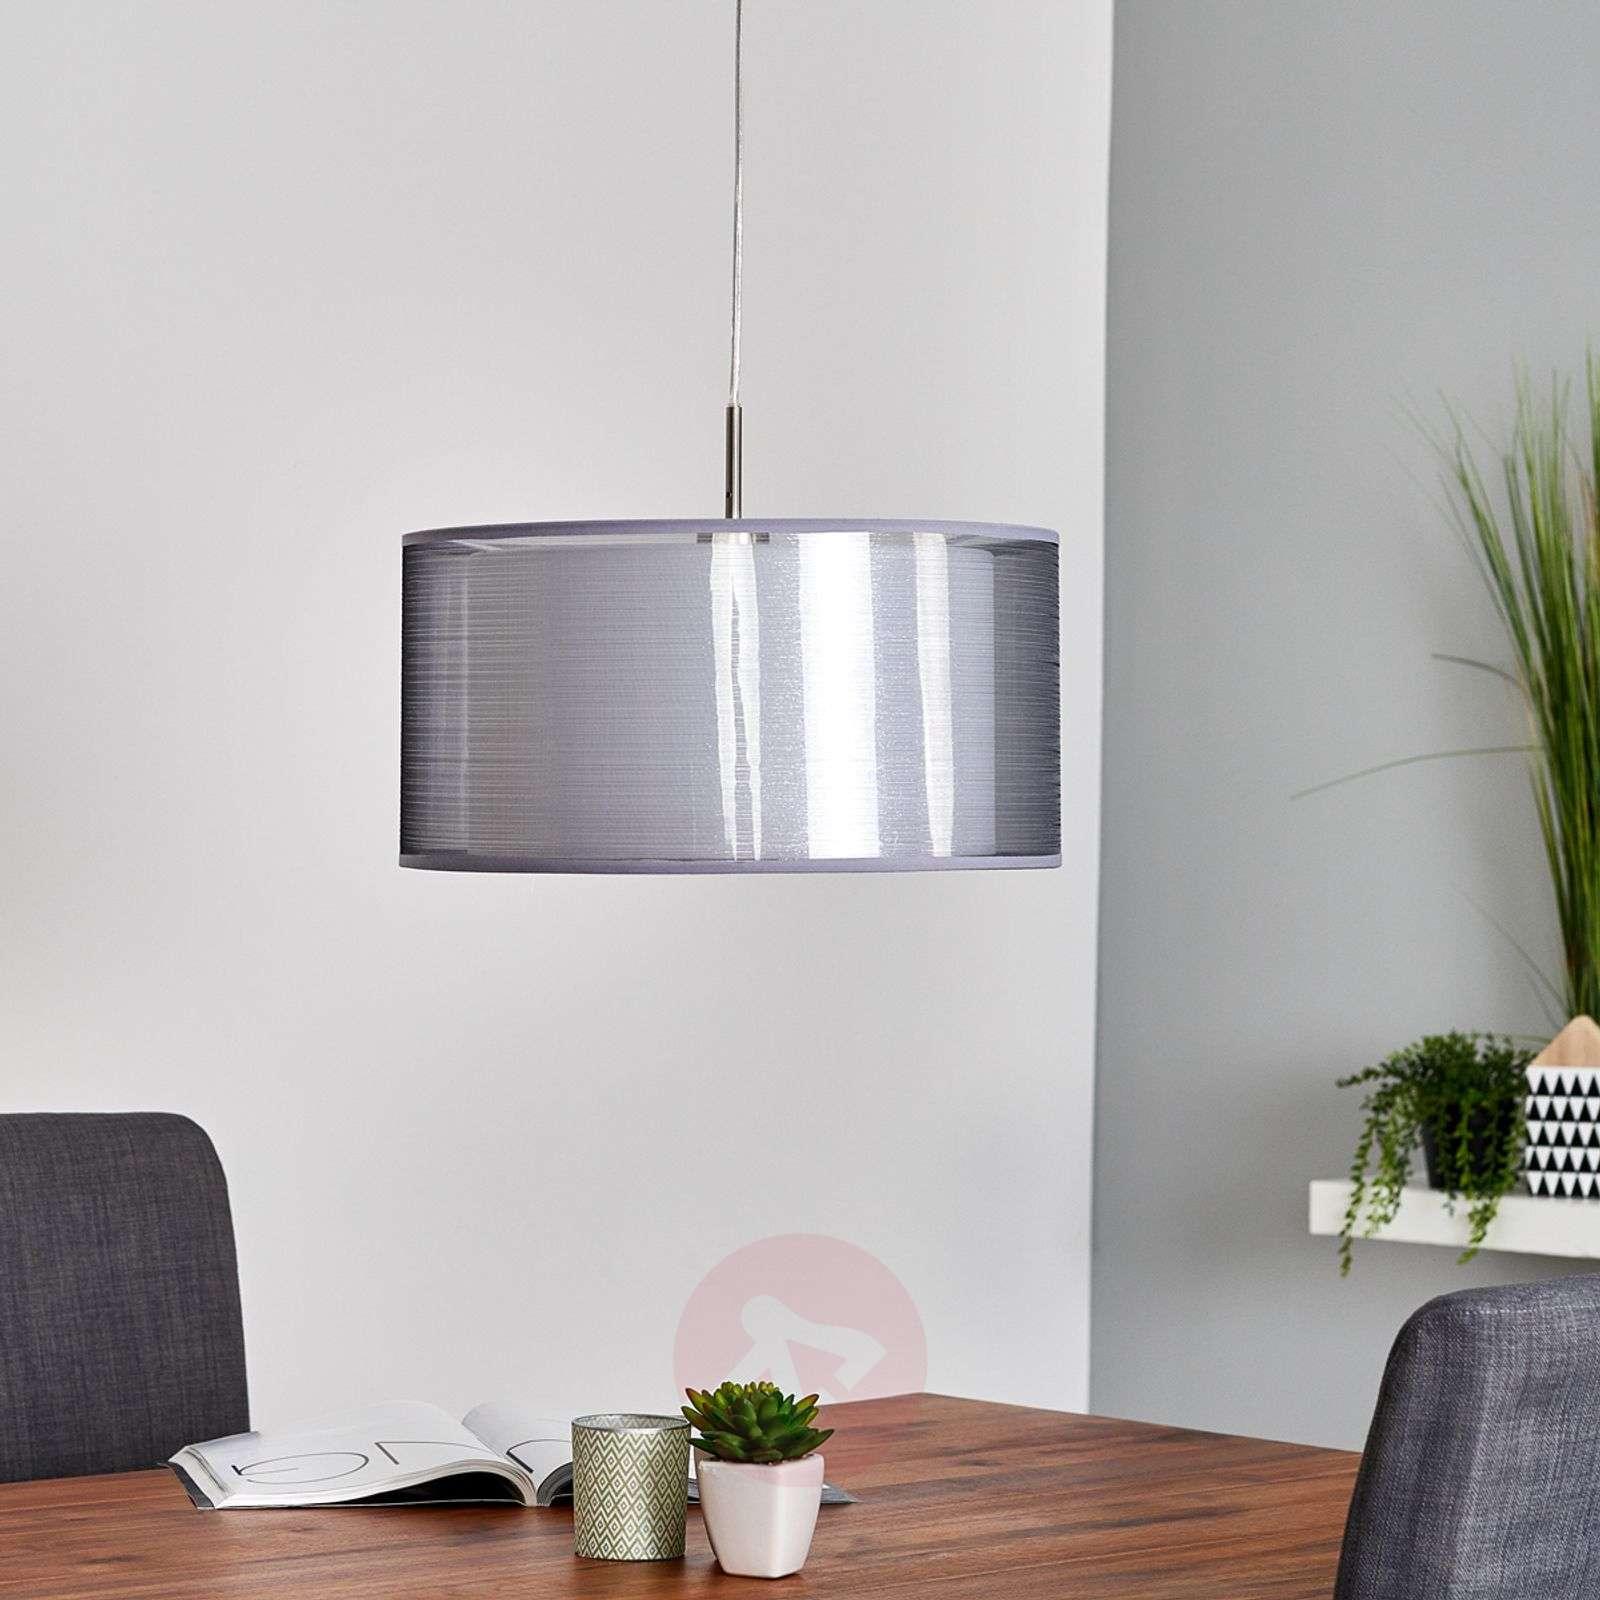 Grey Nica fabric pendant light-4018003-03